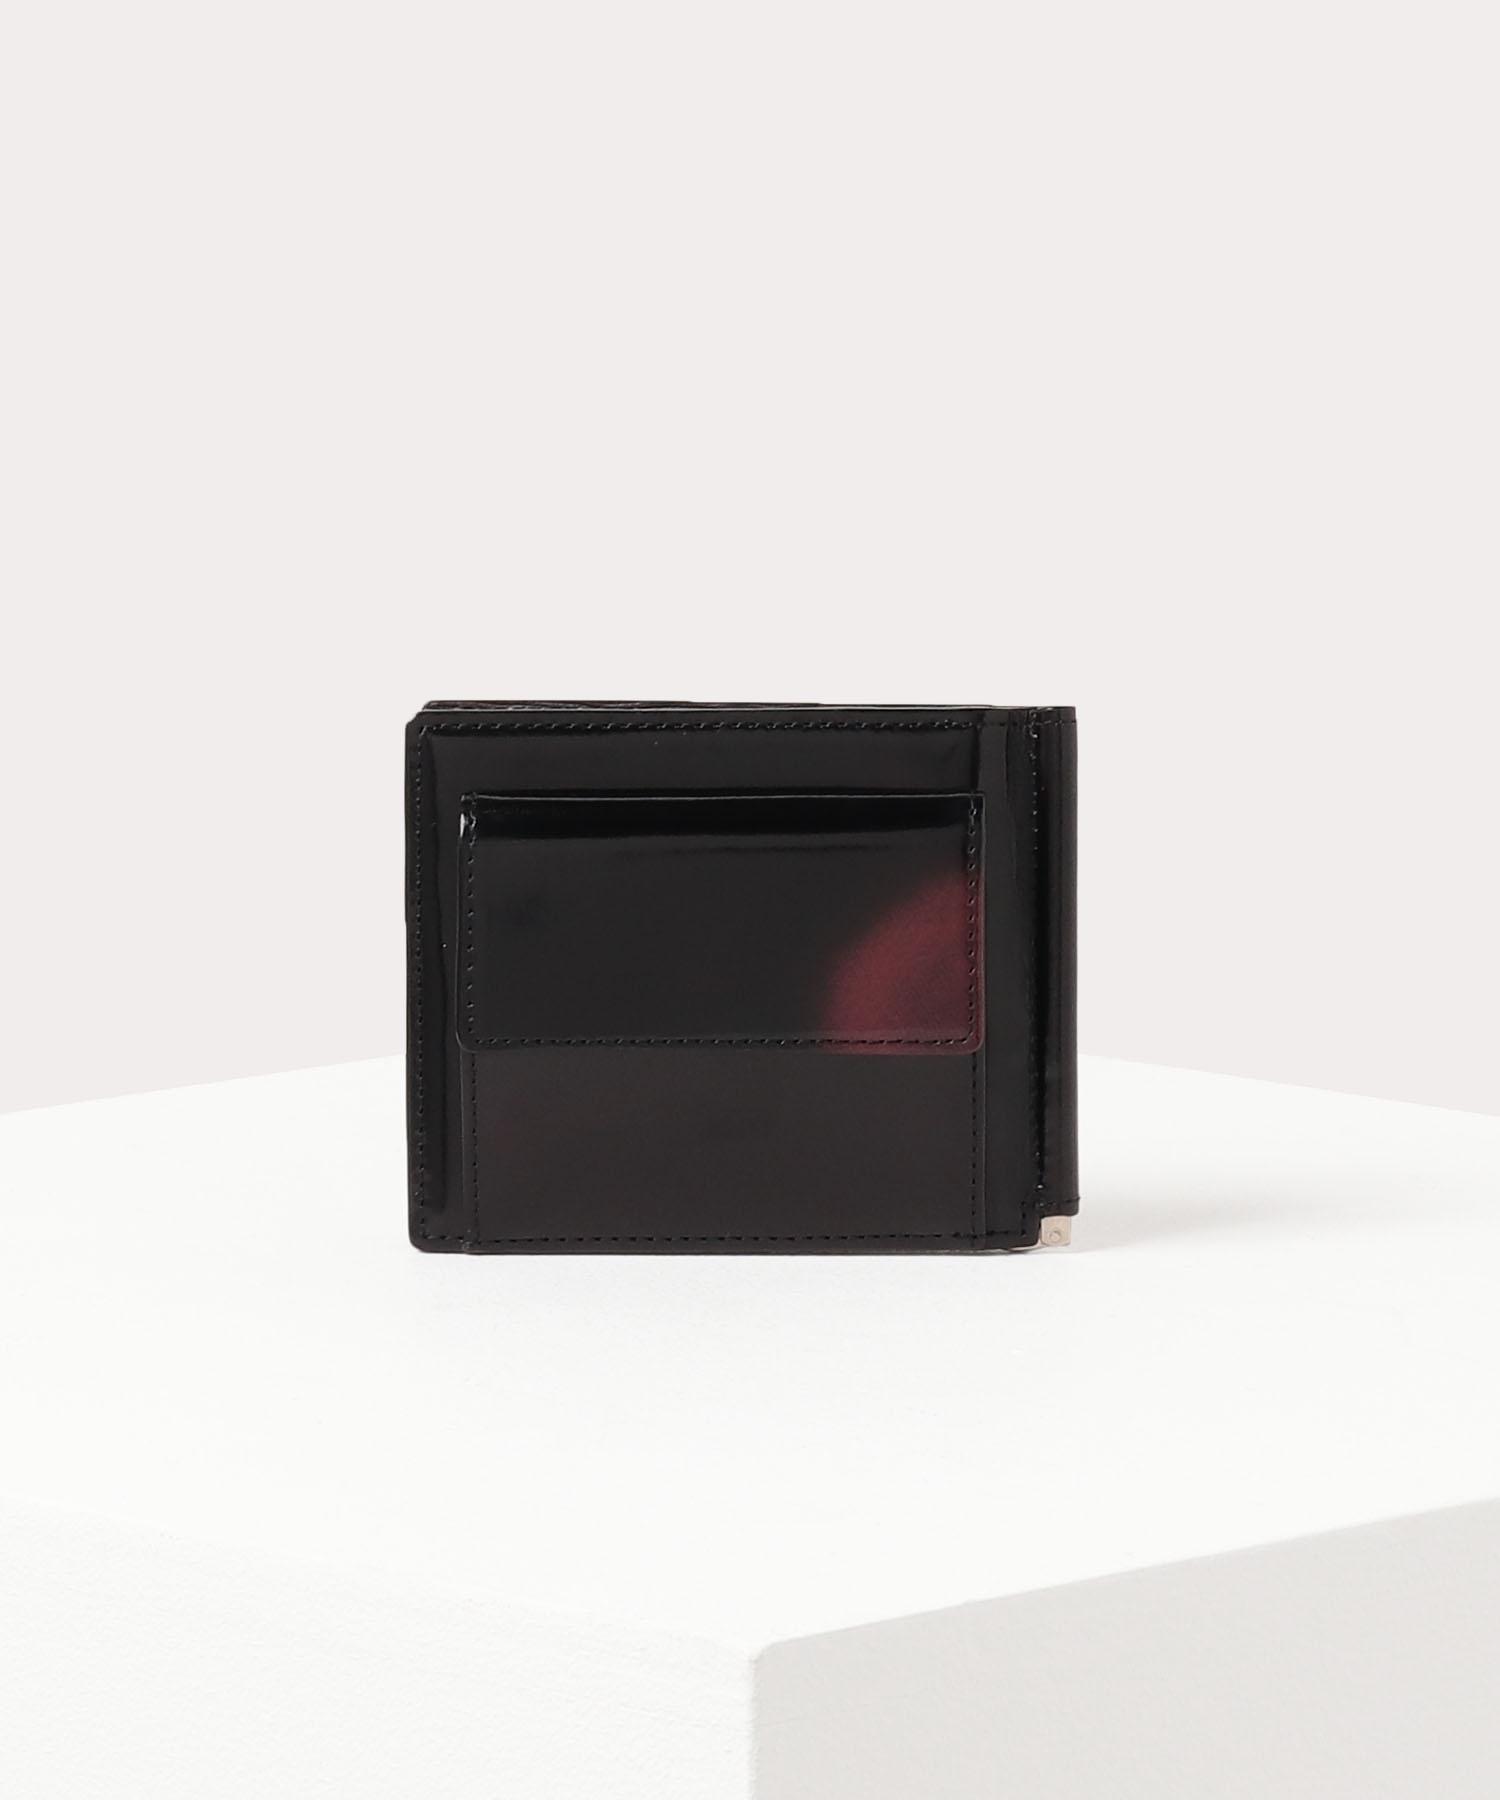 ADVAN マネークリップ付財布